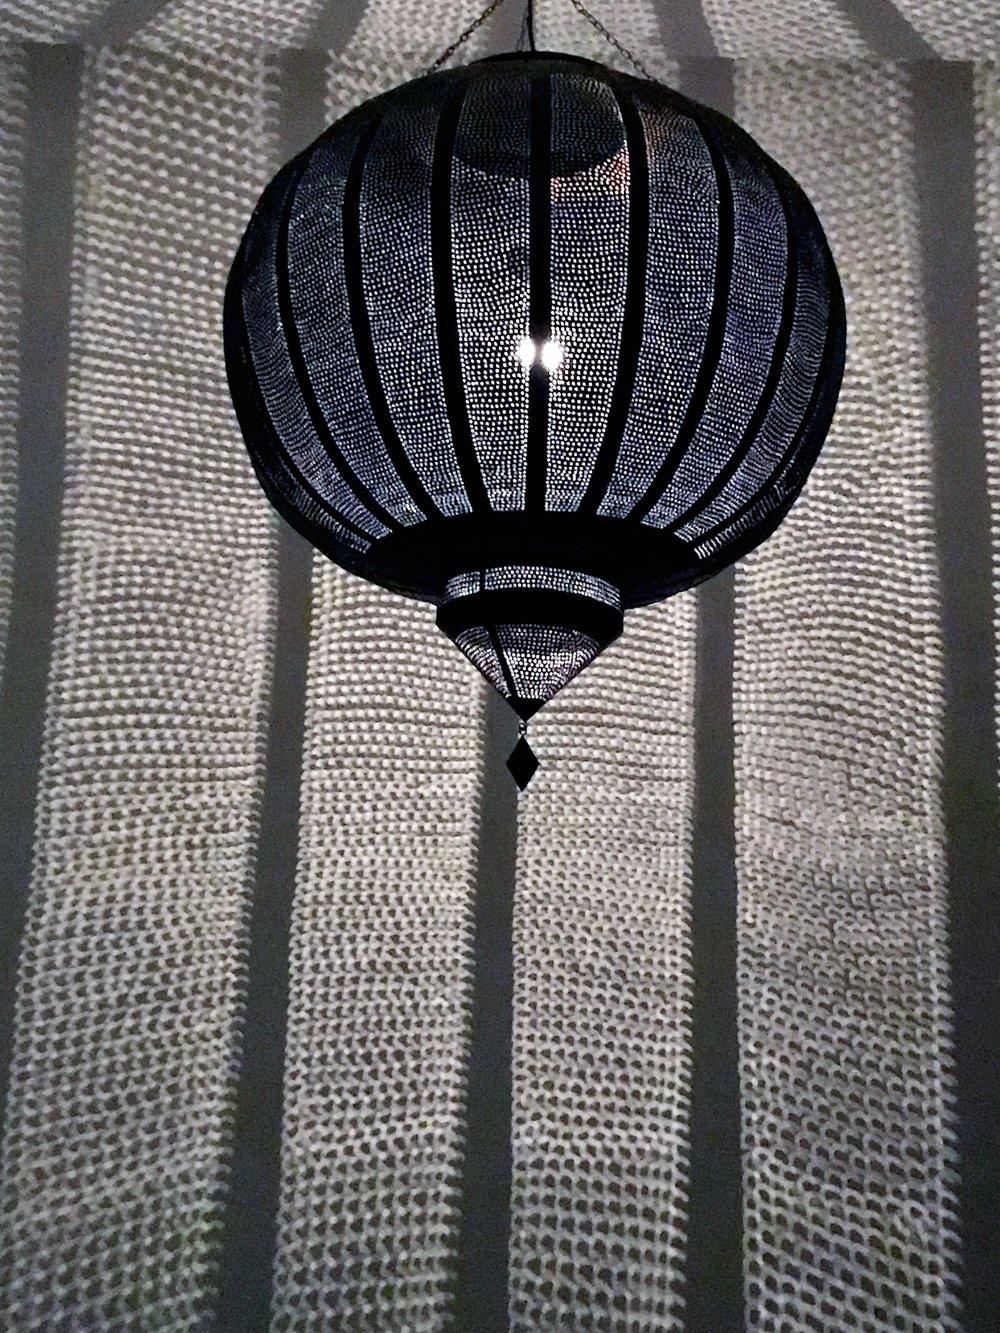 Marrakech-Riad-Be-Mena-lantern.jpg